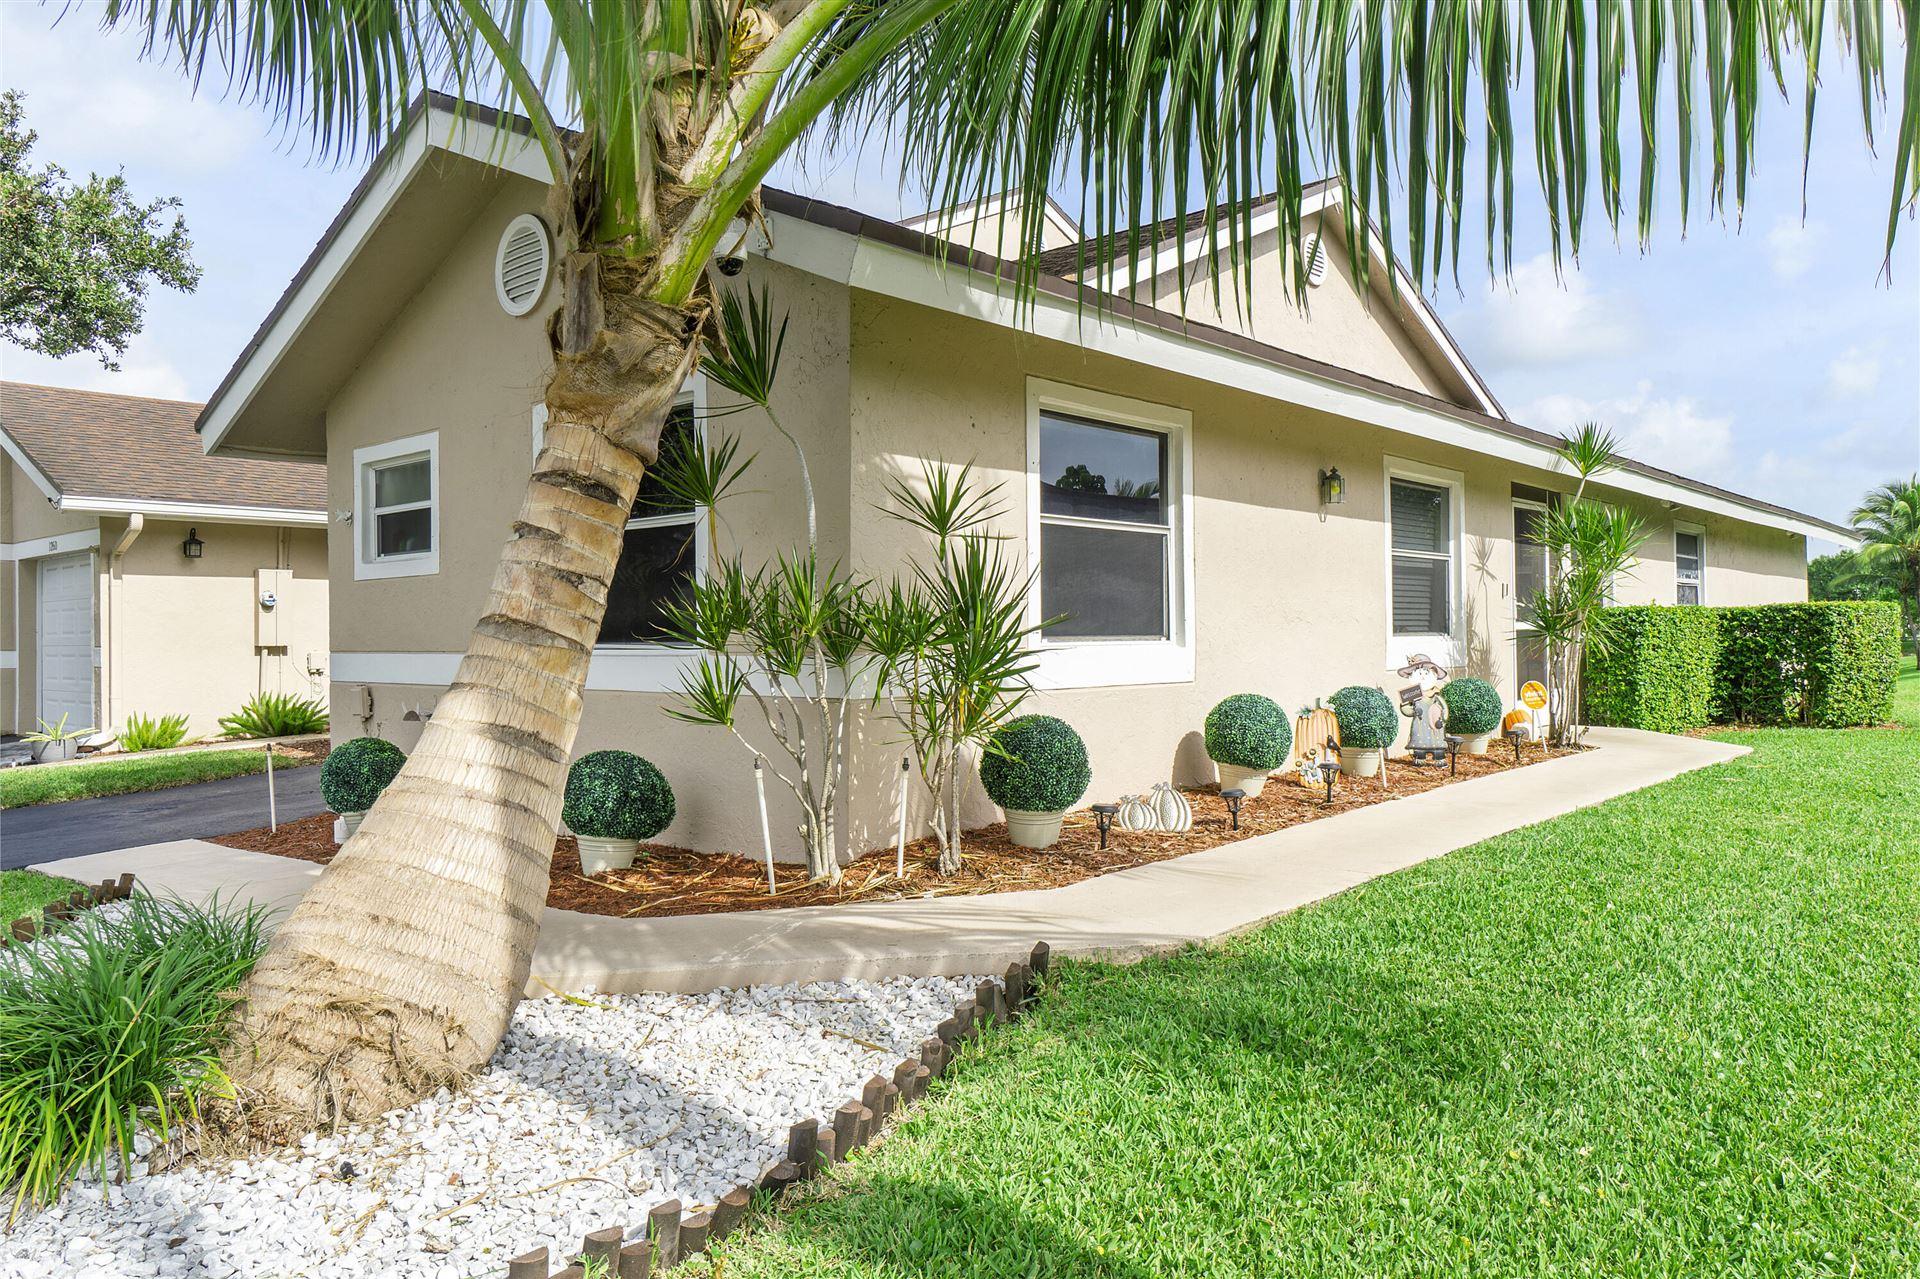 Photo of 1256 W Lakes Drive, Deerfield Beach, FL 33442 (MLS # RX-10749460)